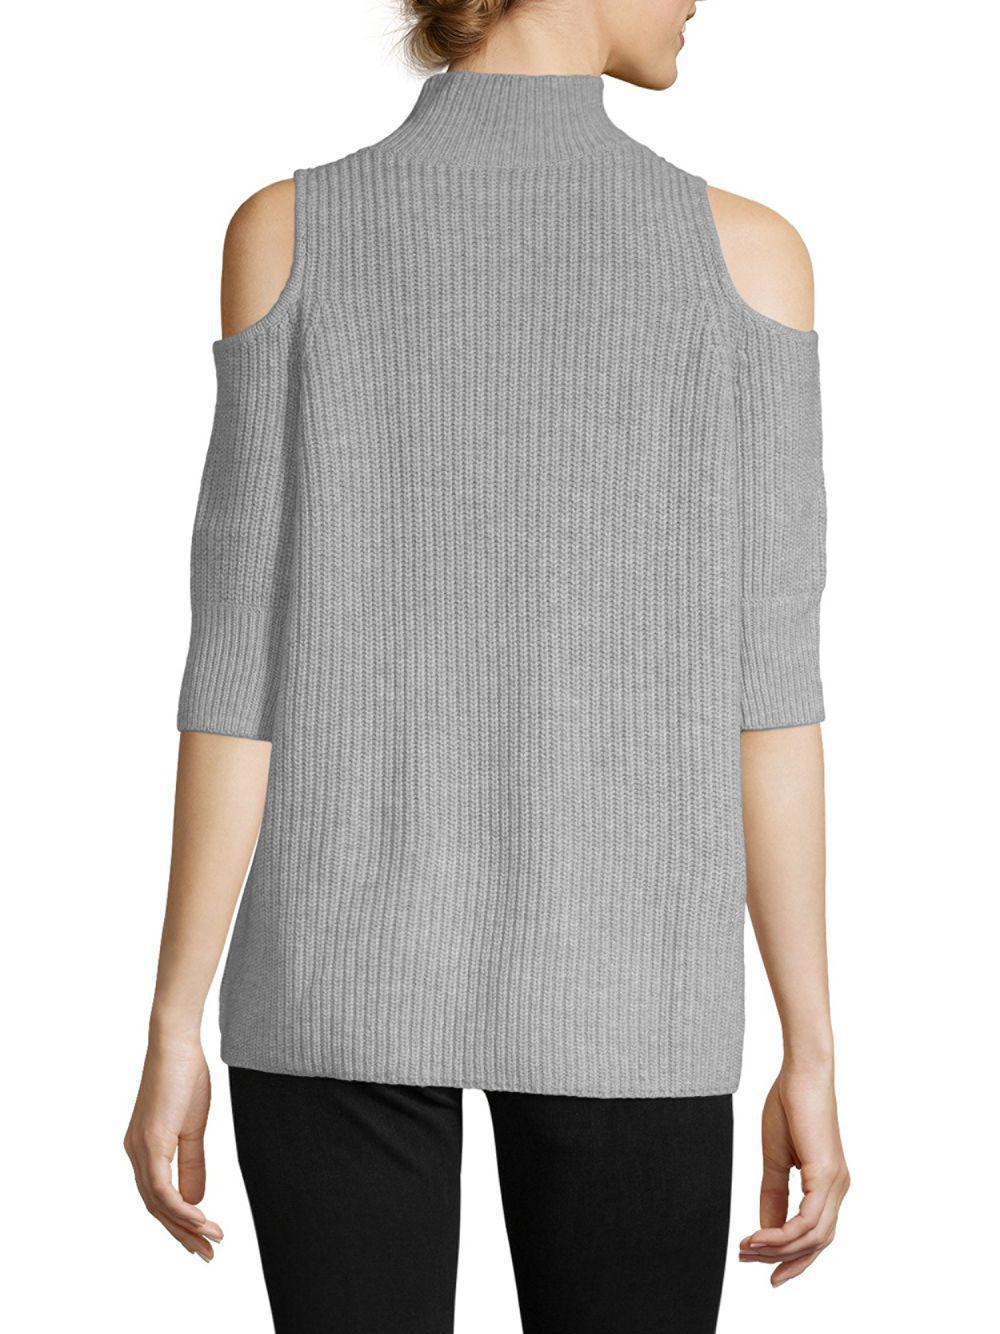 54e3dde8977 Zoe Jordan - Gray Turtleneck Cold-shoulder Sweater - Lyst. View fullscreen